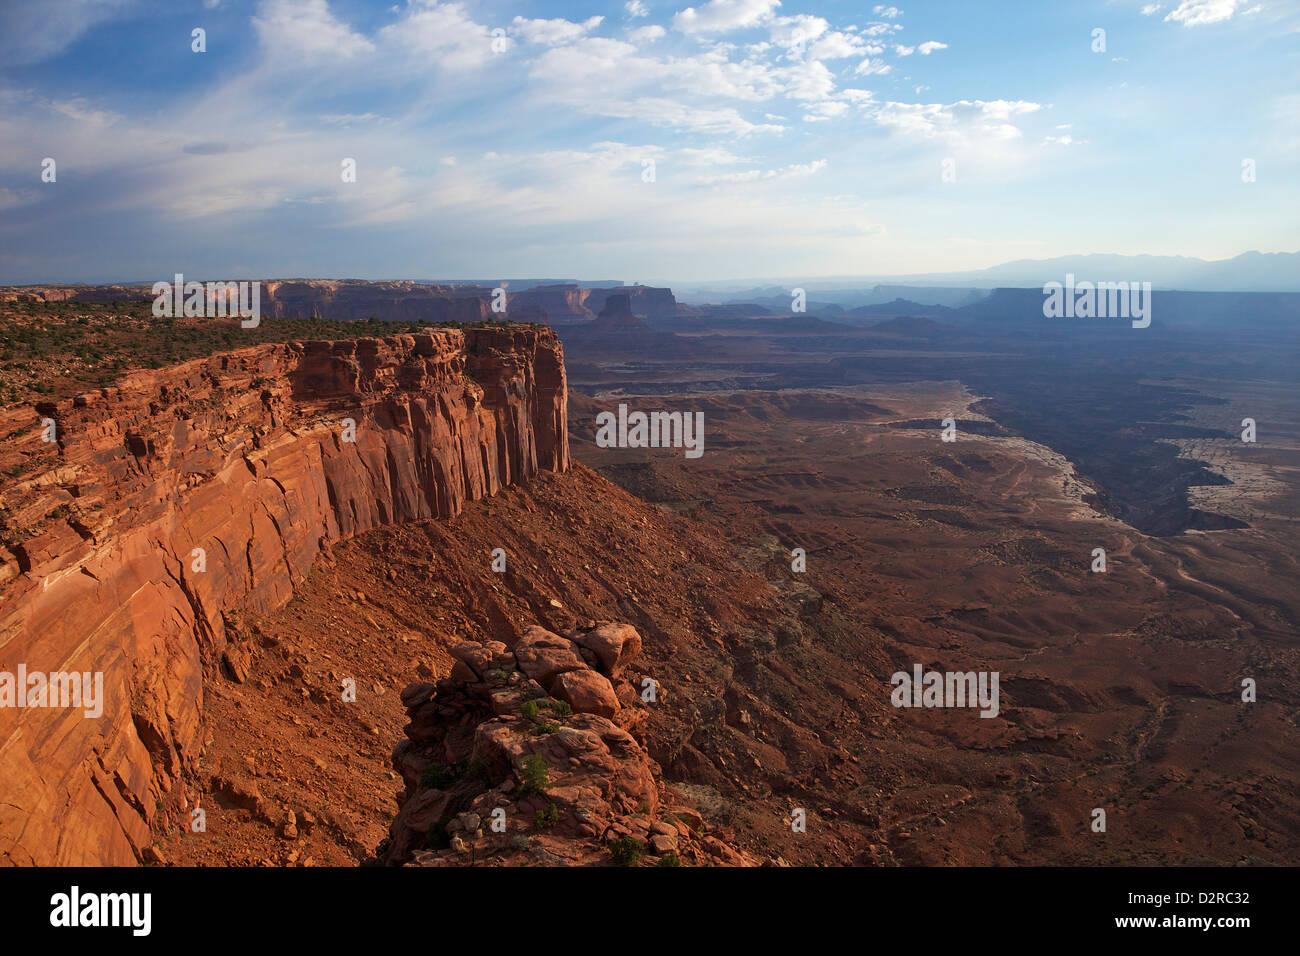 Buck Canyon Viewpoint, Canyonlands National Park, Utah, Vereinigte Staaten von Amerika, Nordamerika Stockbild